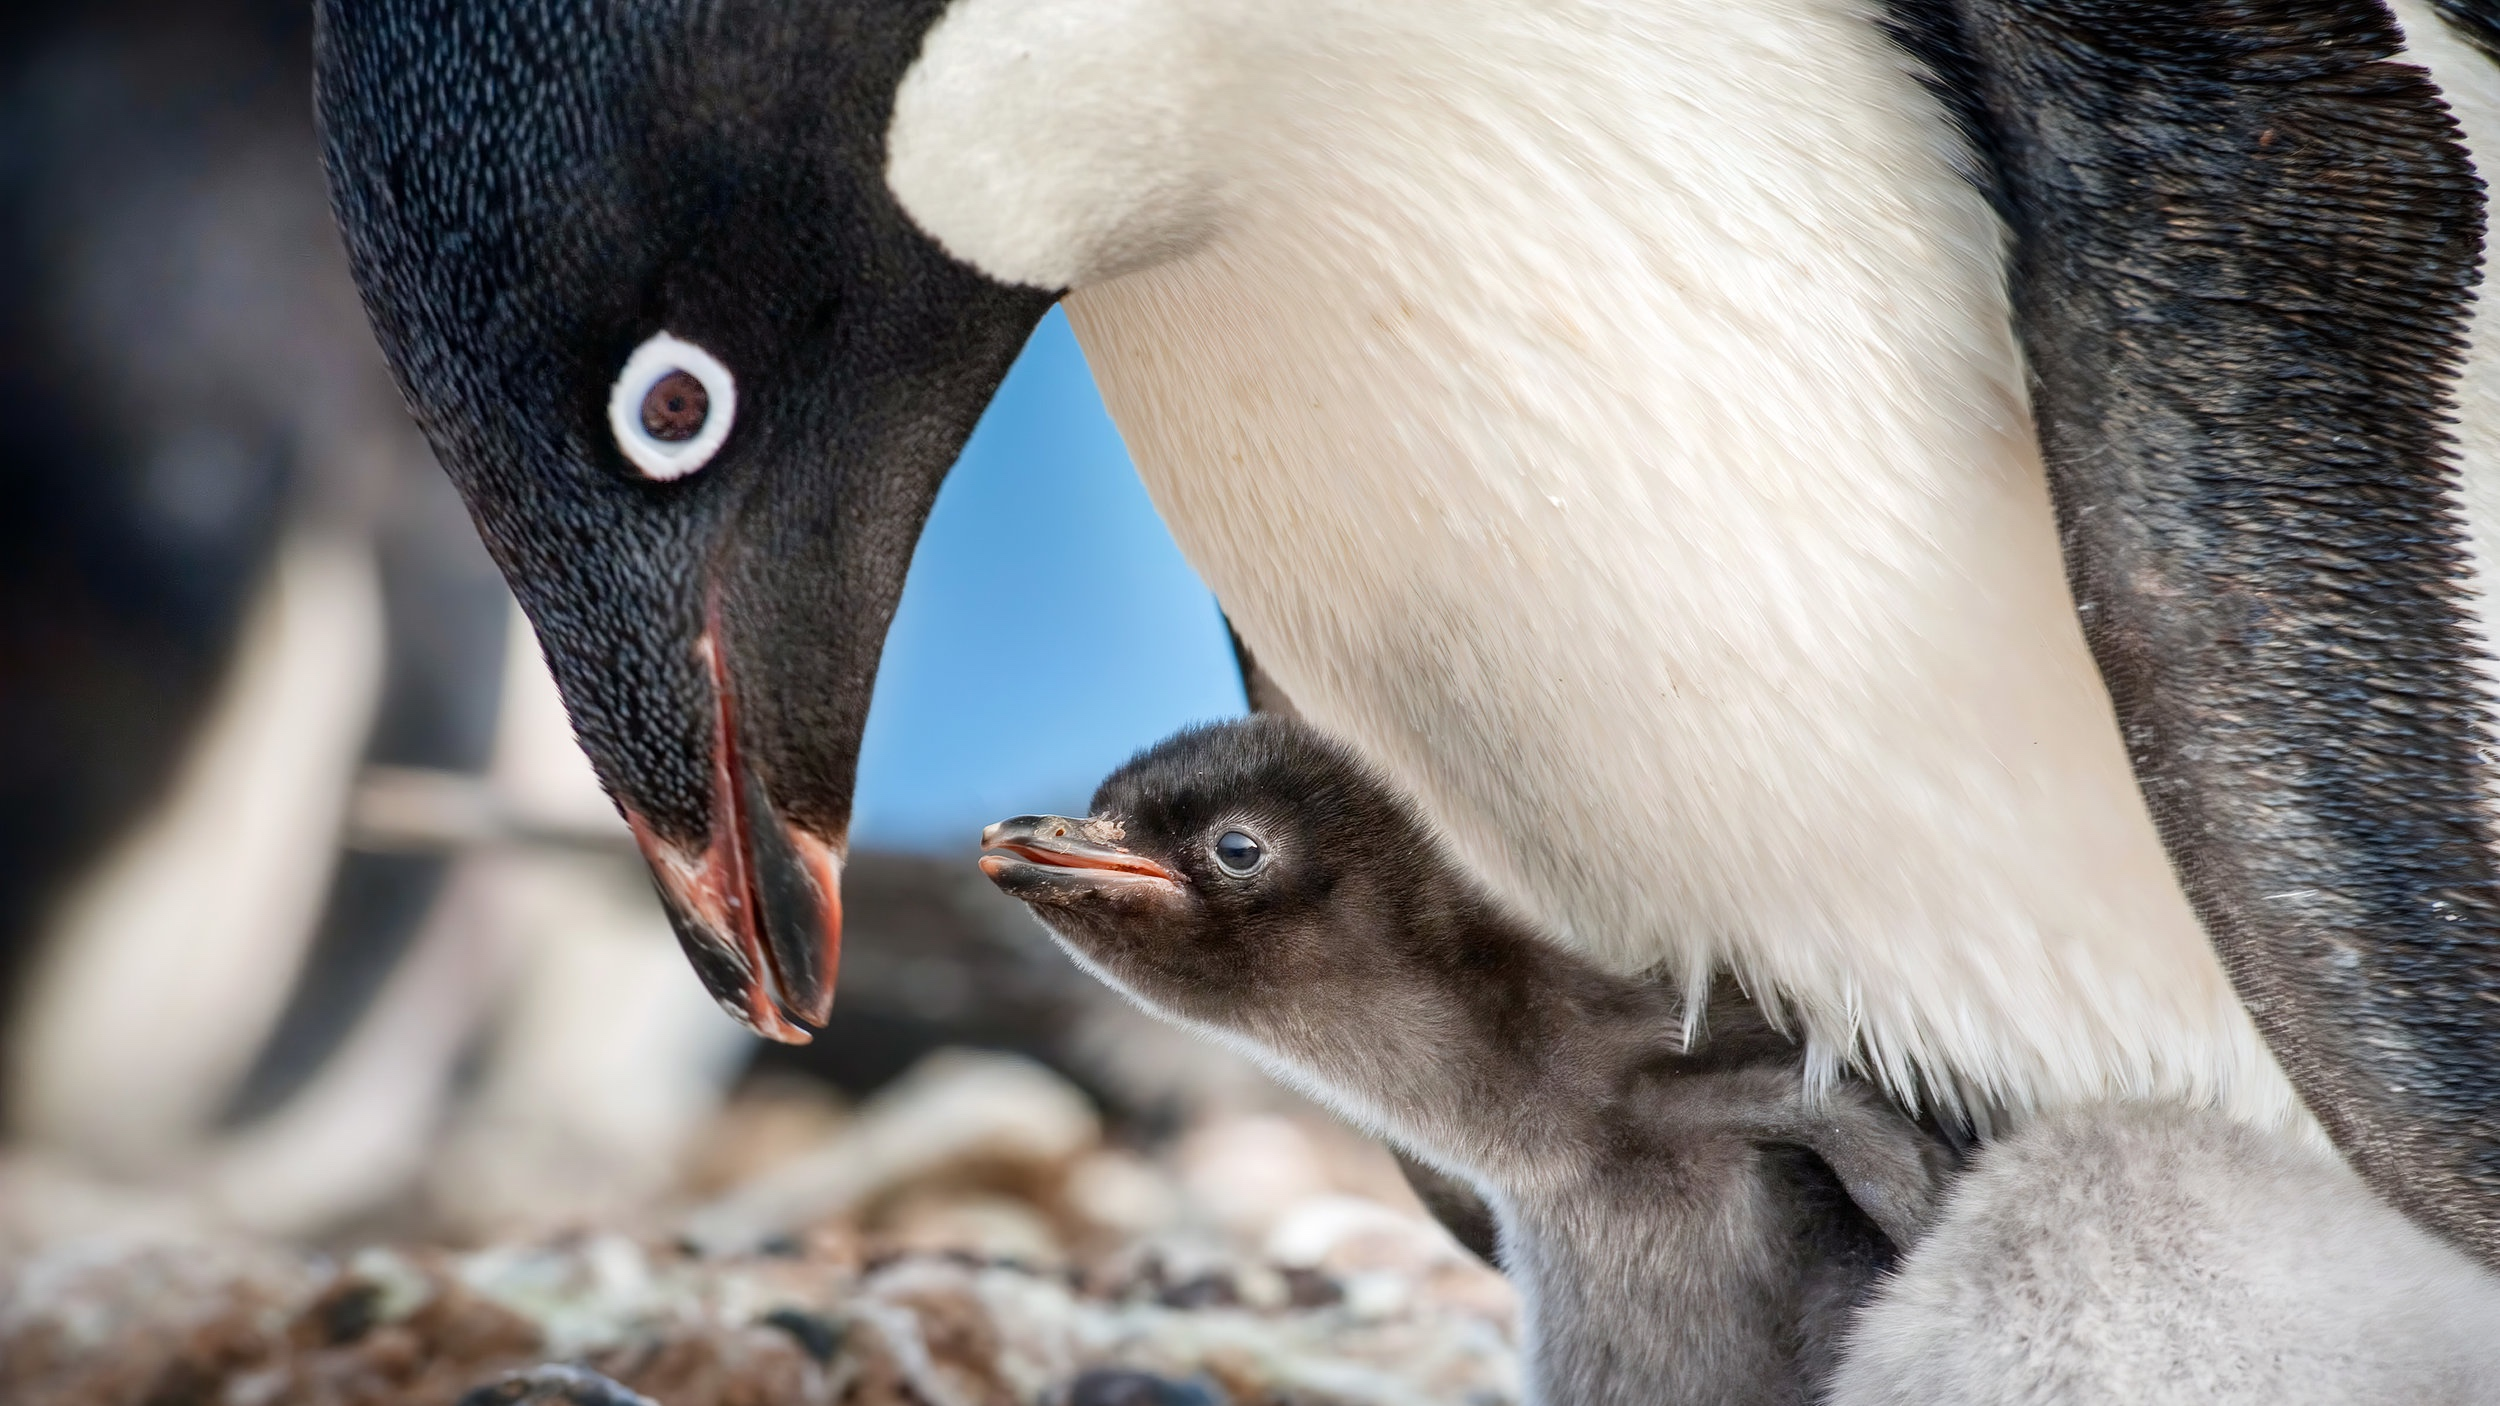 Penguins5c2f98b545de6.jpg